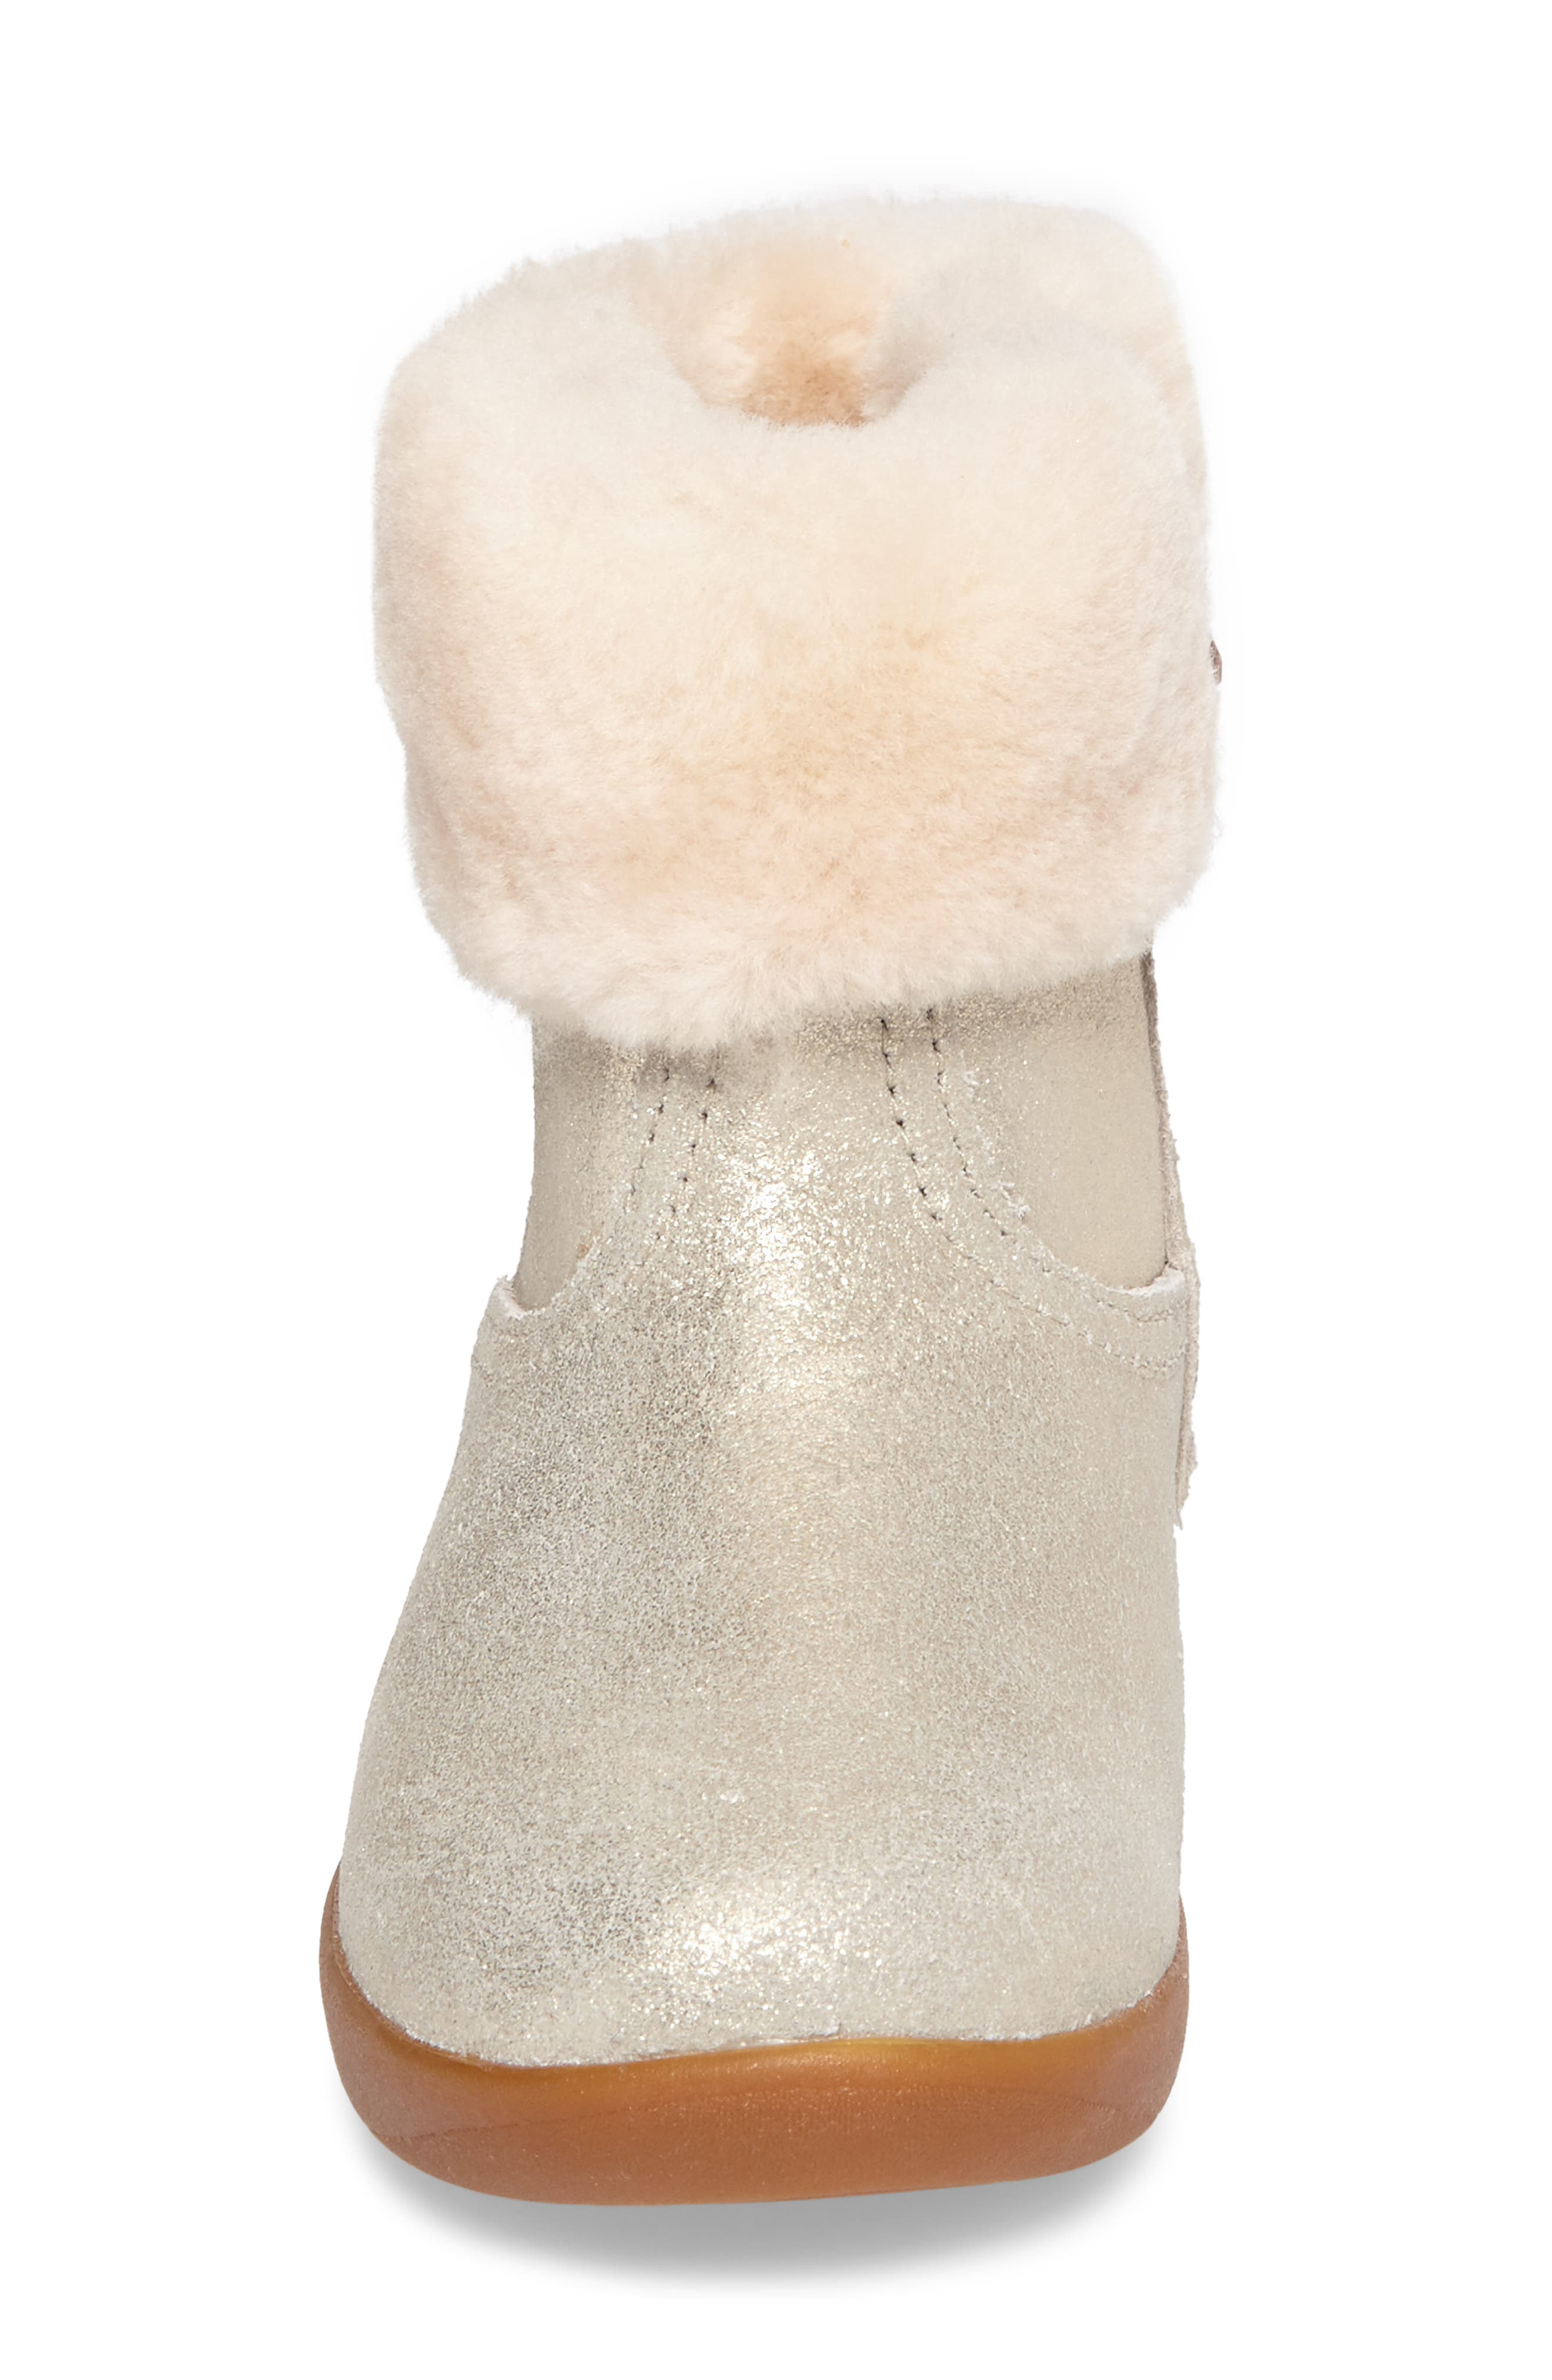 UGG<SUP>®</SUP>, Jorie II Genuine Shearling Metallic Boot, Alternate thumbnail 4, color, METALLIC GOLD